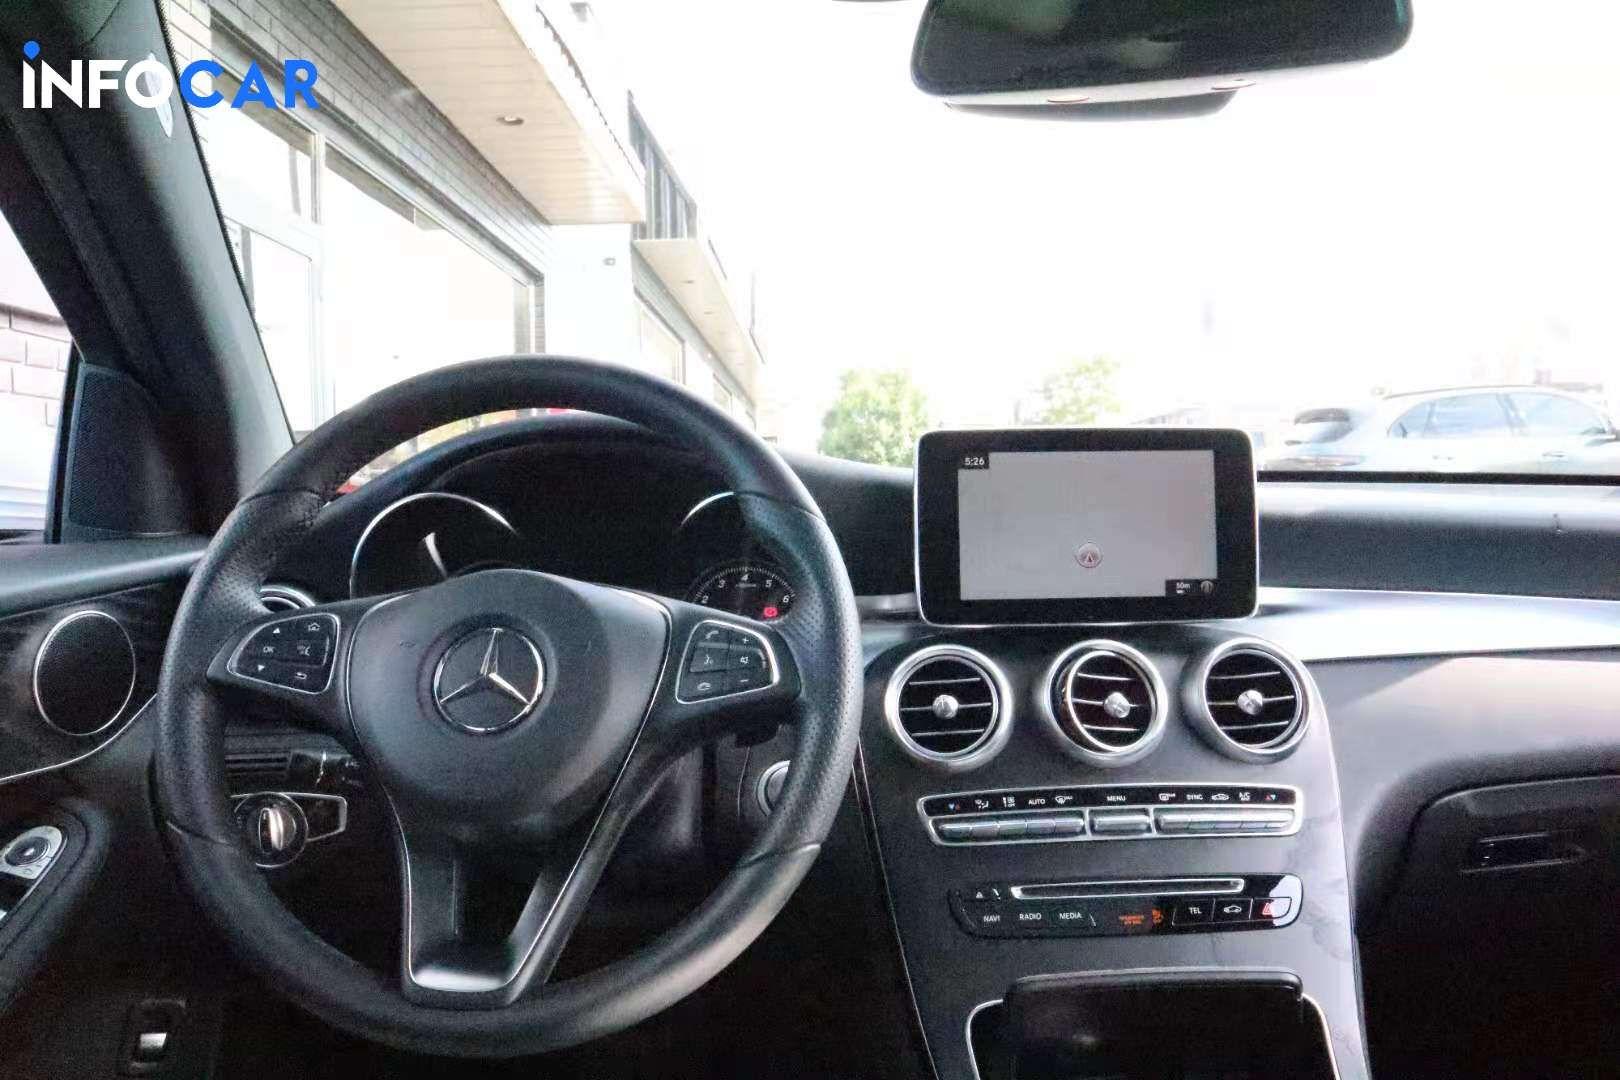 2018 Mercedes-Benz GLC-Class 300 - INFOCAR - Toronto's Most Comprehensive New and Used Auto Trading Platform